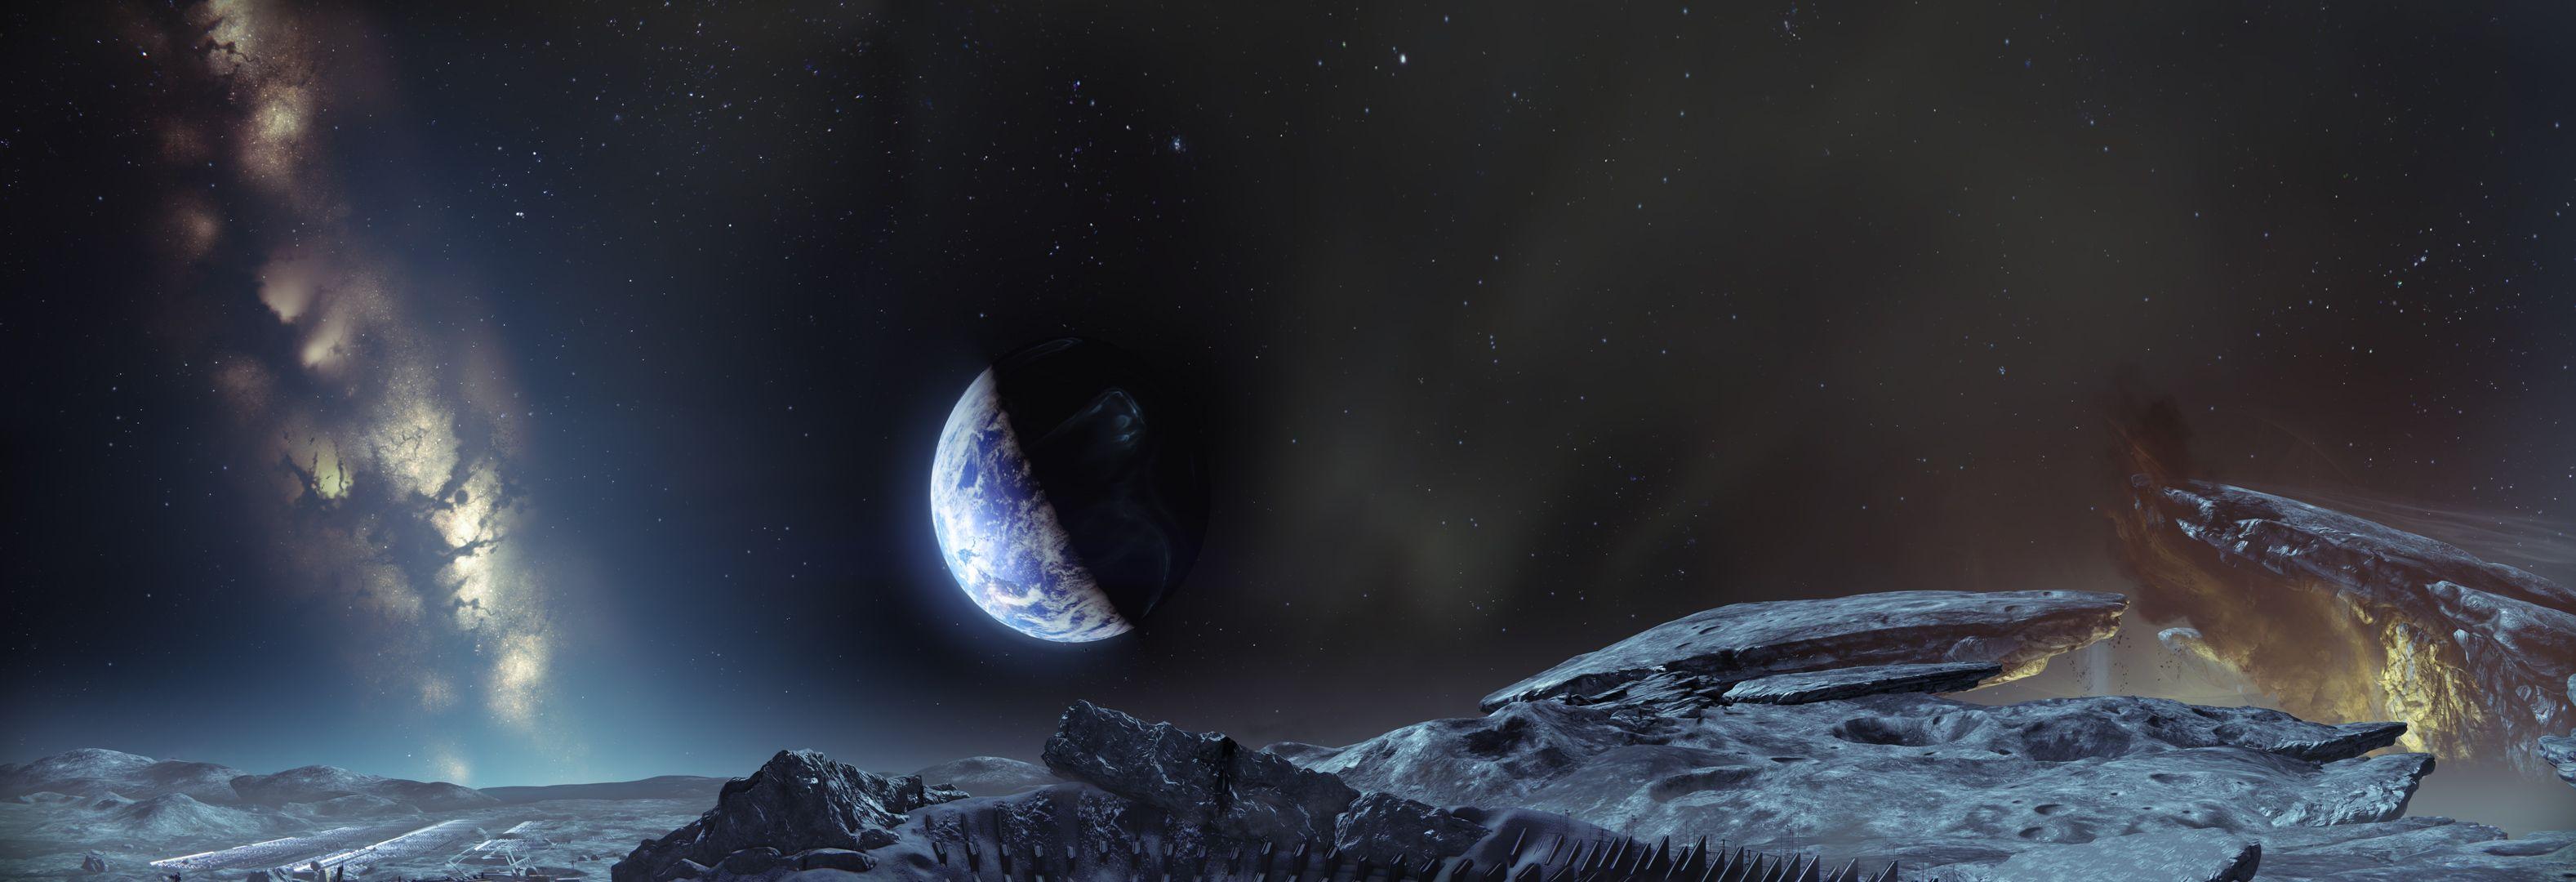 The Story Behind Destiny S Biggest Star The Sky Concept Art Digital Sky Art Fallen Empire